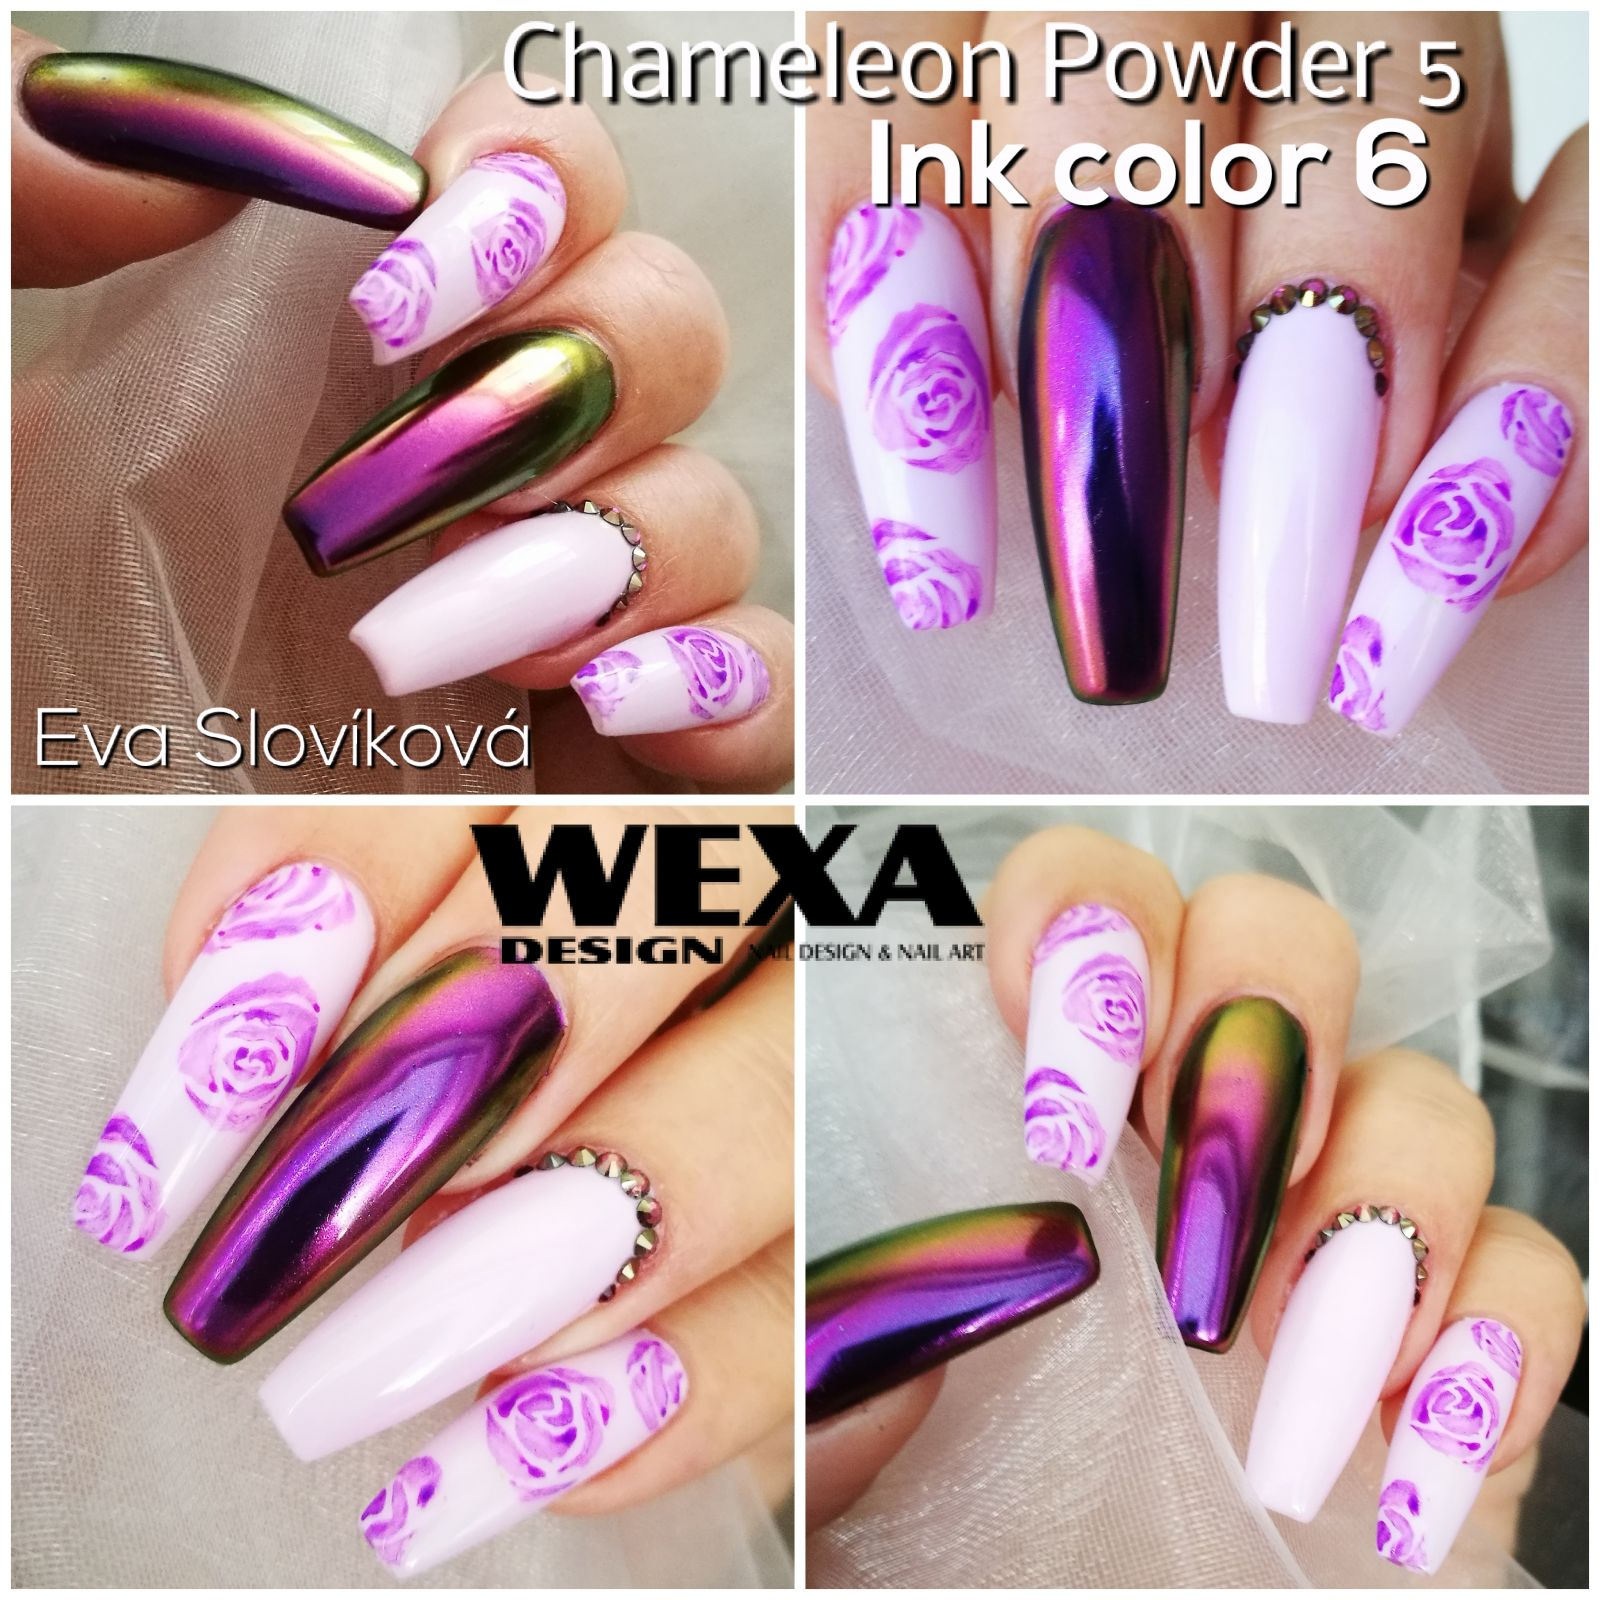 Chameleon Chrome Powder 5